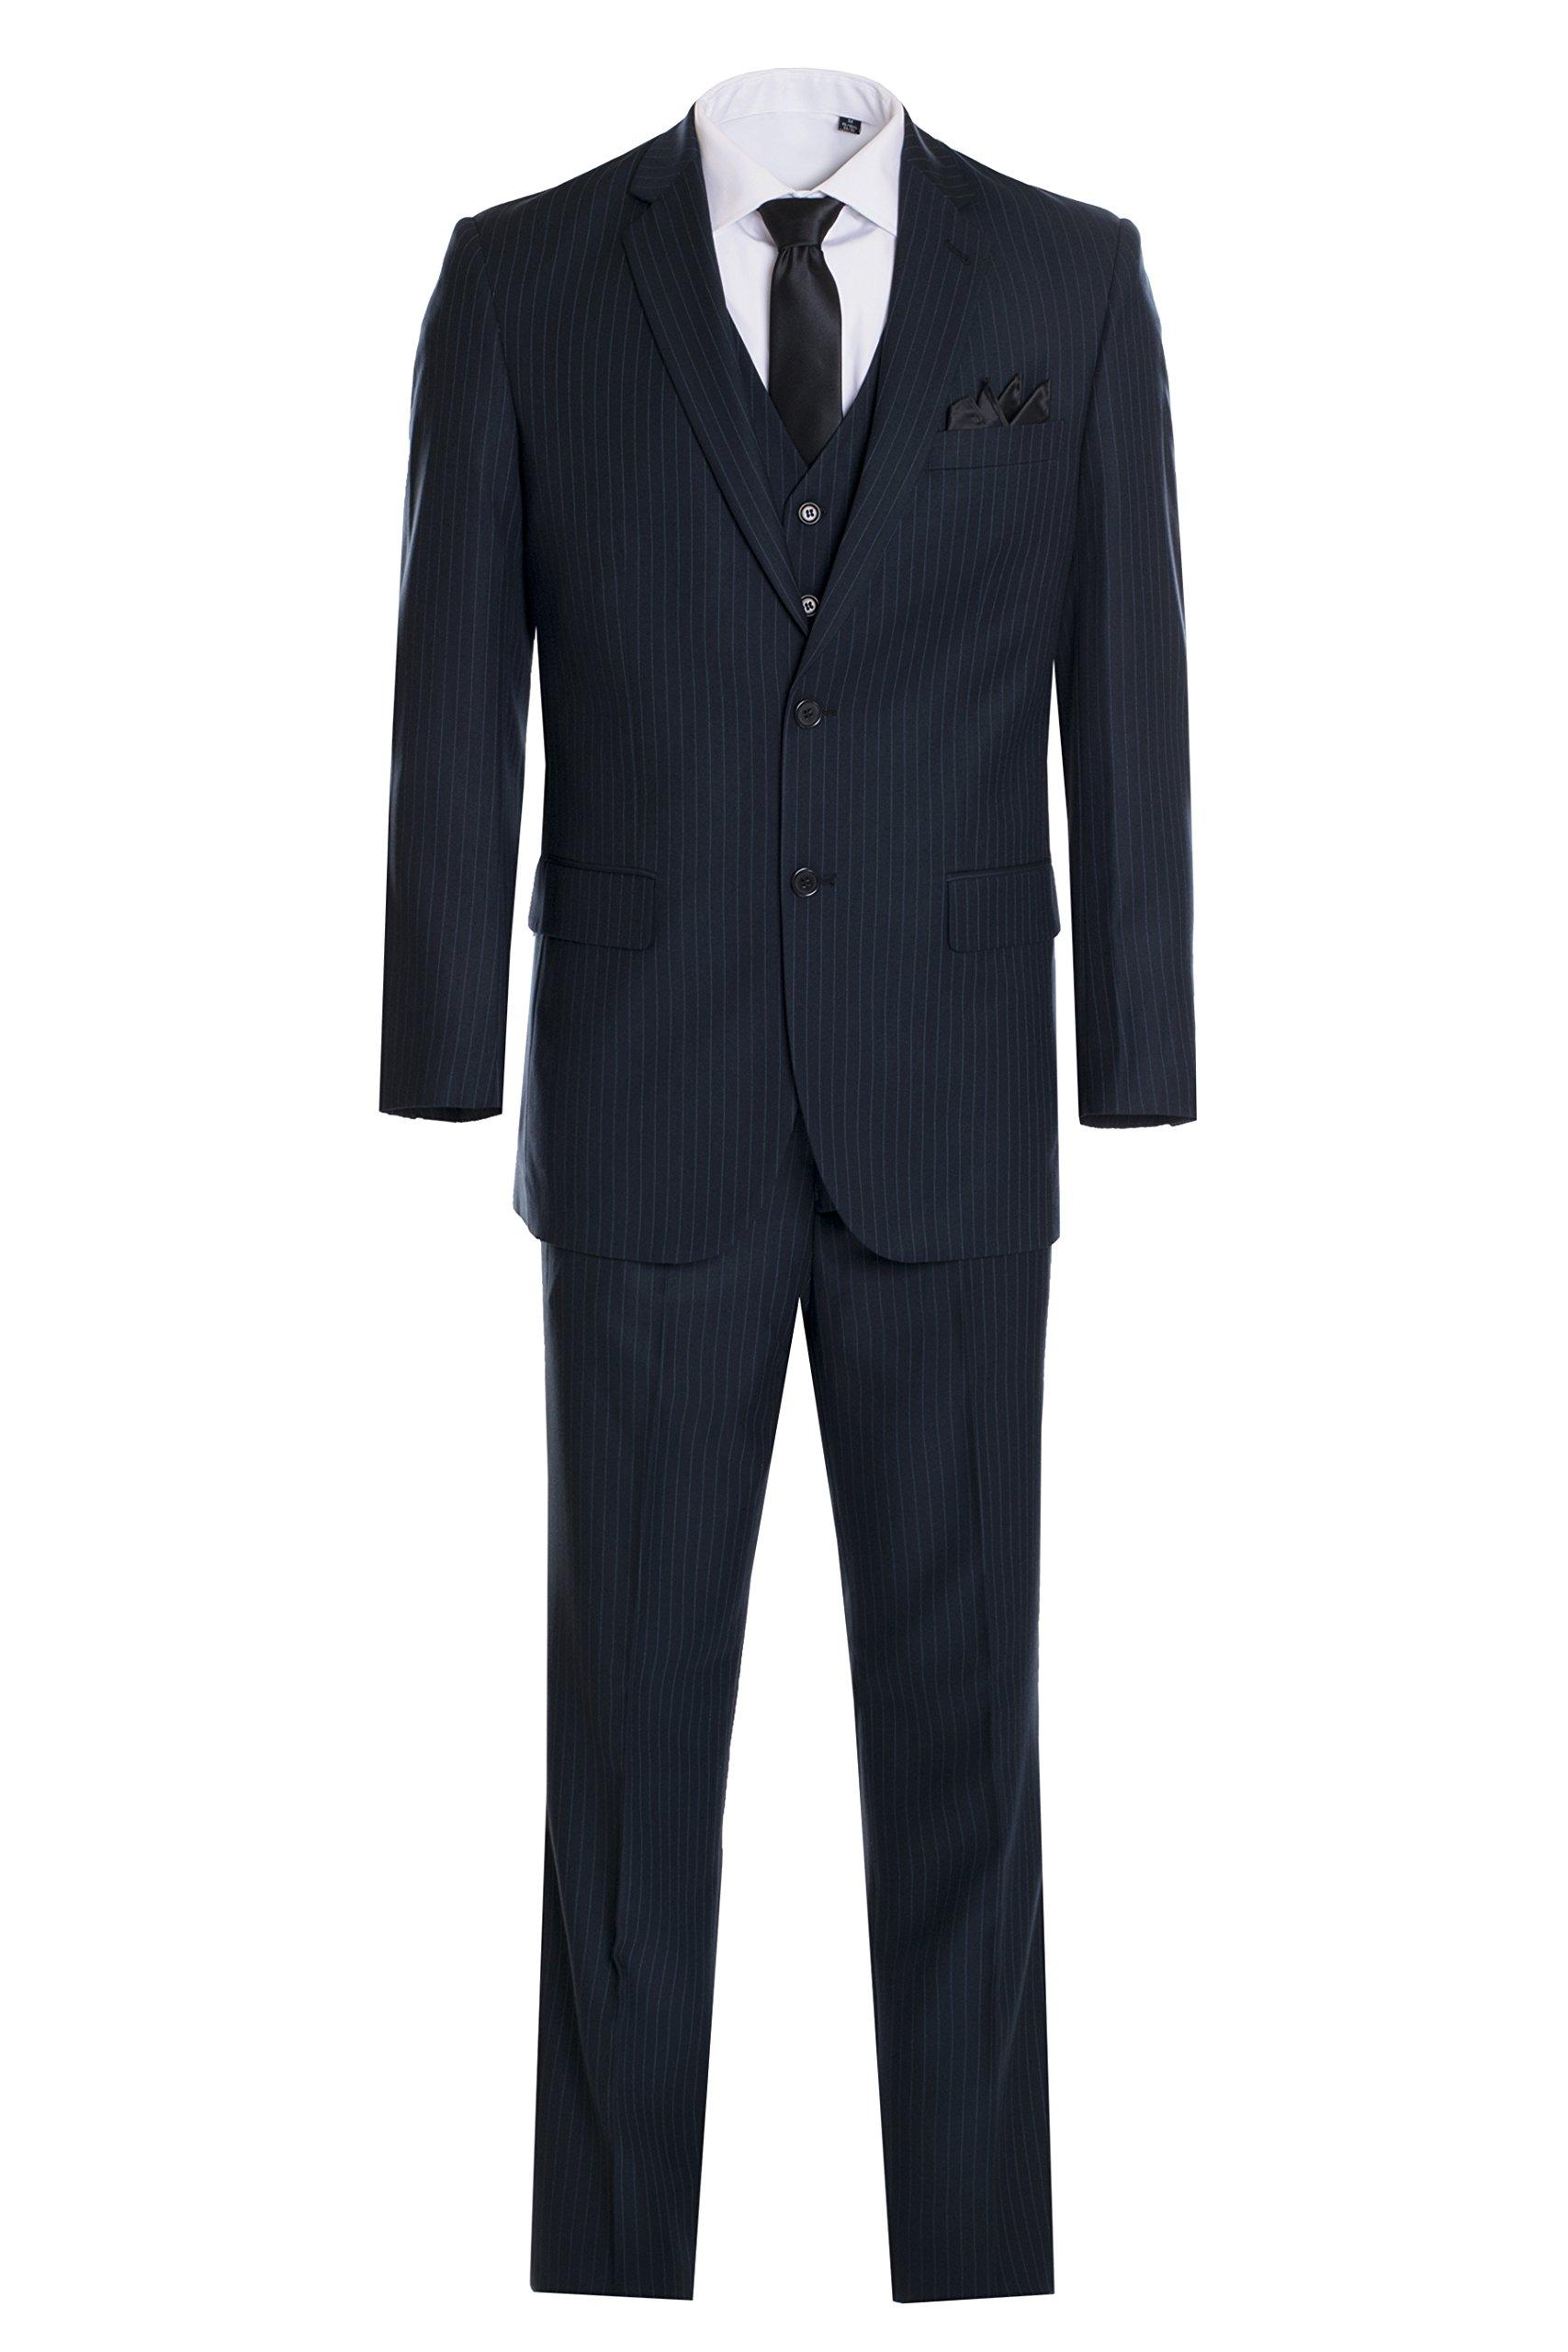 King Formal Wear Men's Premium Modern Fit Pinstripe Suit - Many Colors (Navy Pinstripe, 46 Regular)…